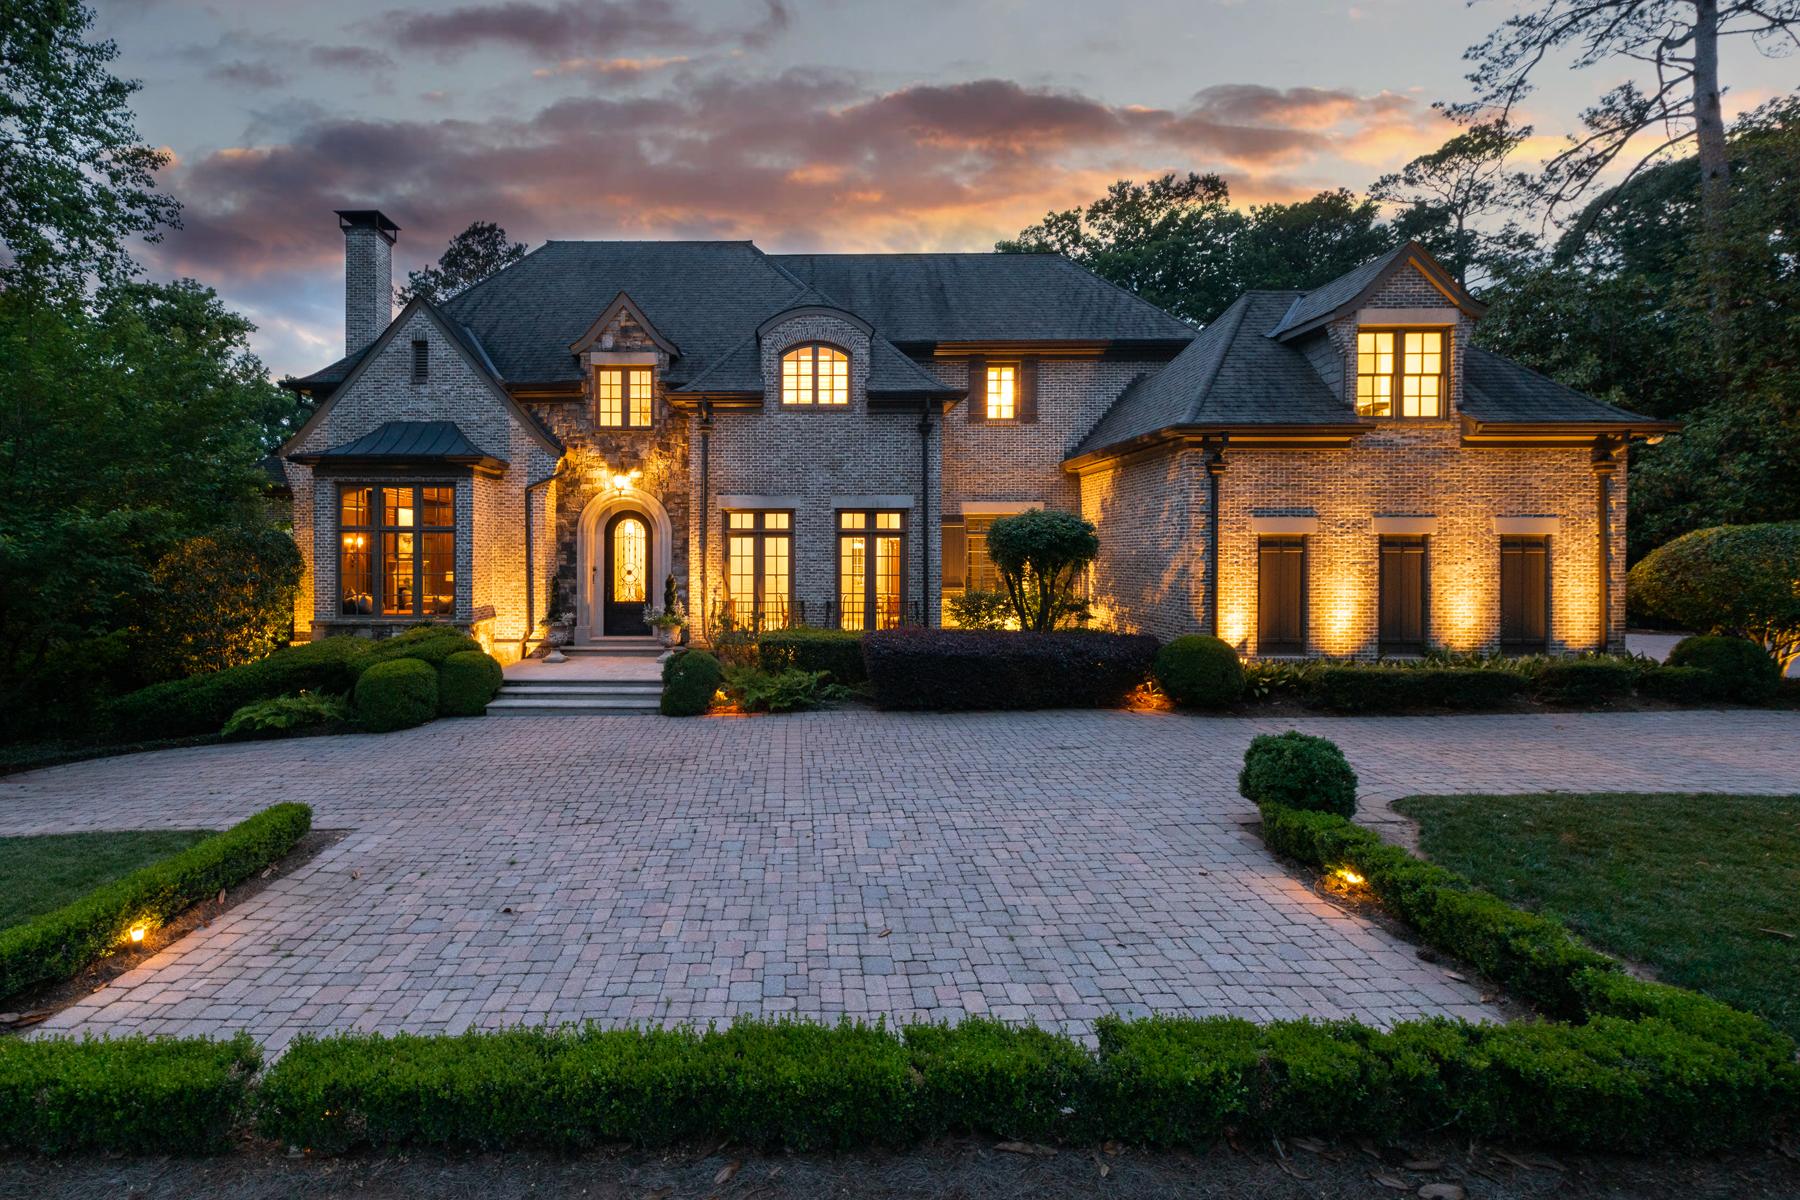 Property for Sale at Sophisticated Elegance 4076 Glen Devon Drive NW Atlanta, Georgia 30327 United States